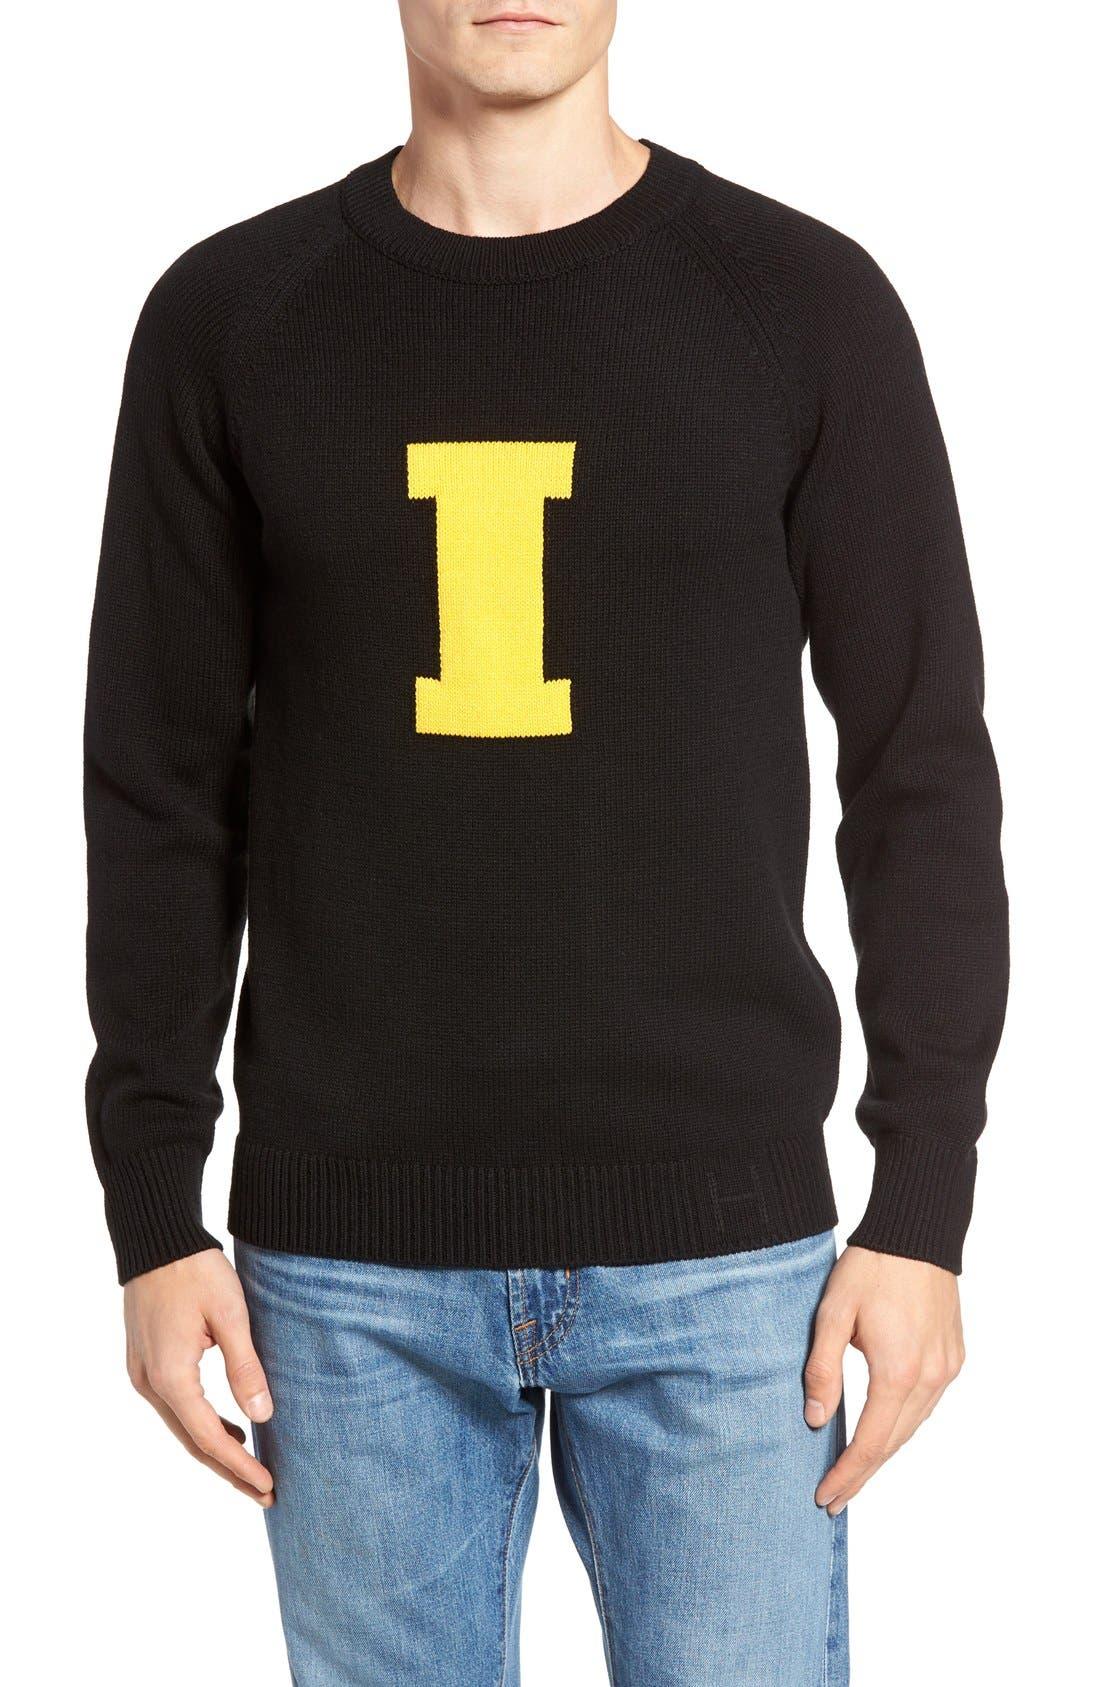 HILLFLINT,                             Iowa Heritage Sweater,                             Main thumbnail 1, color,                             001